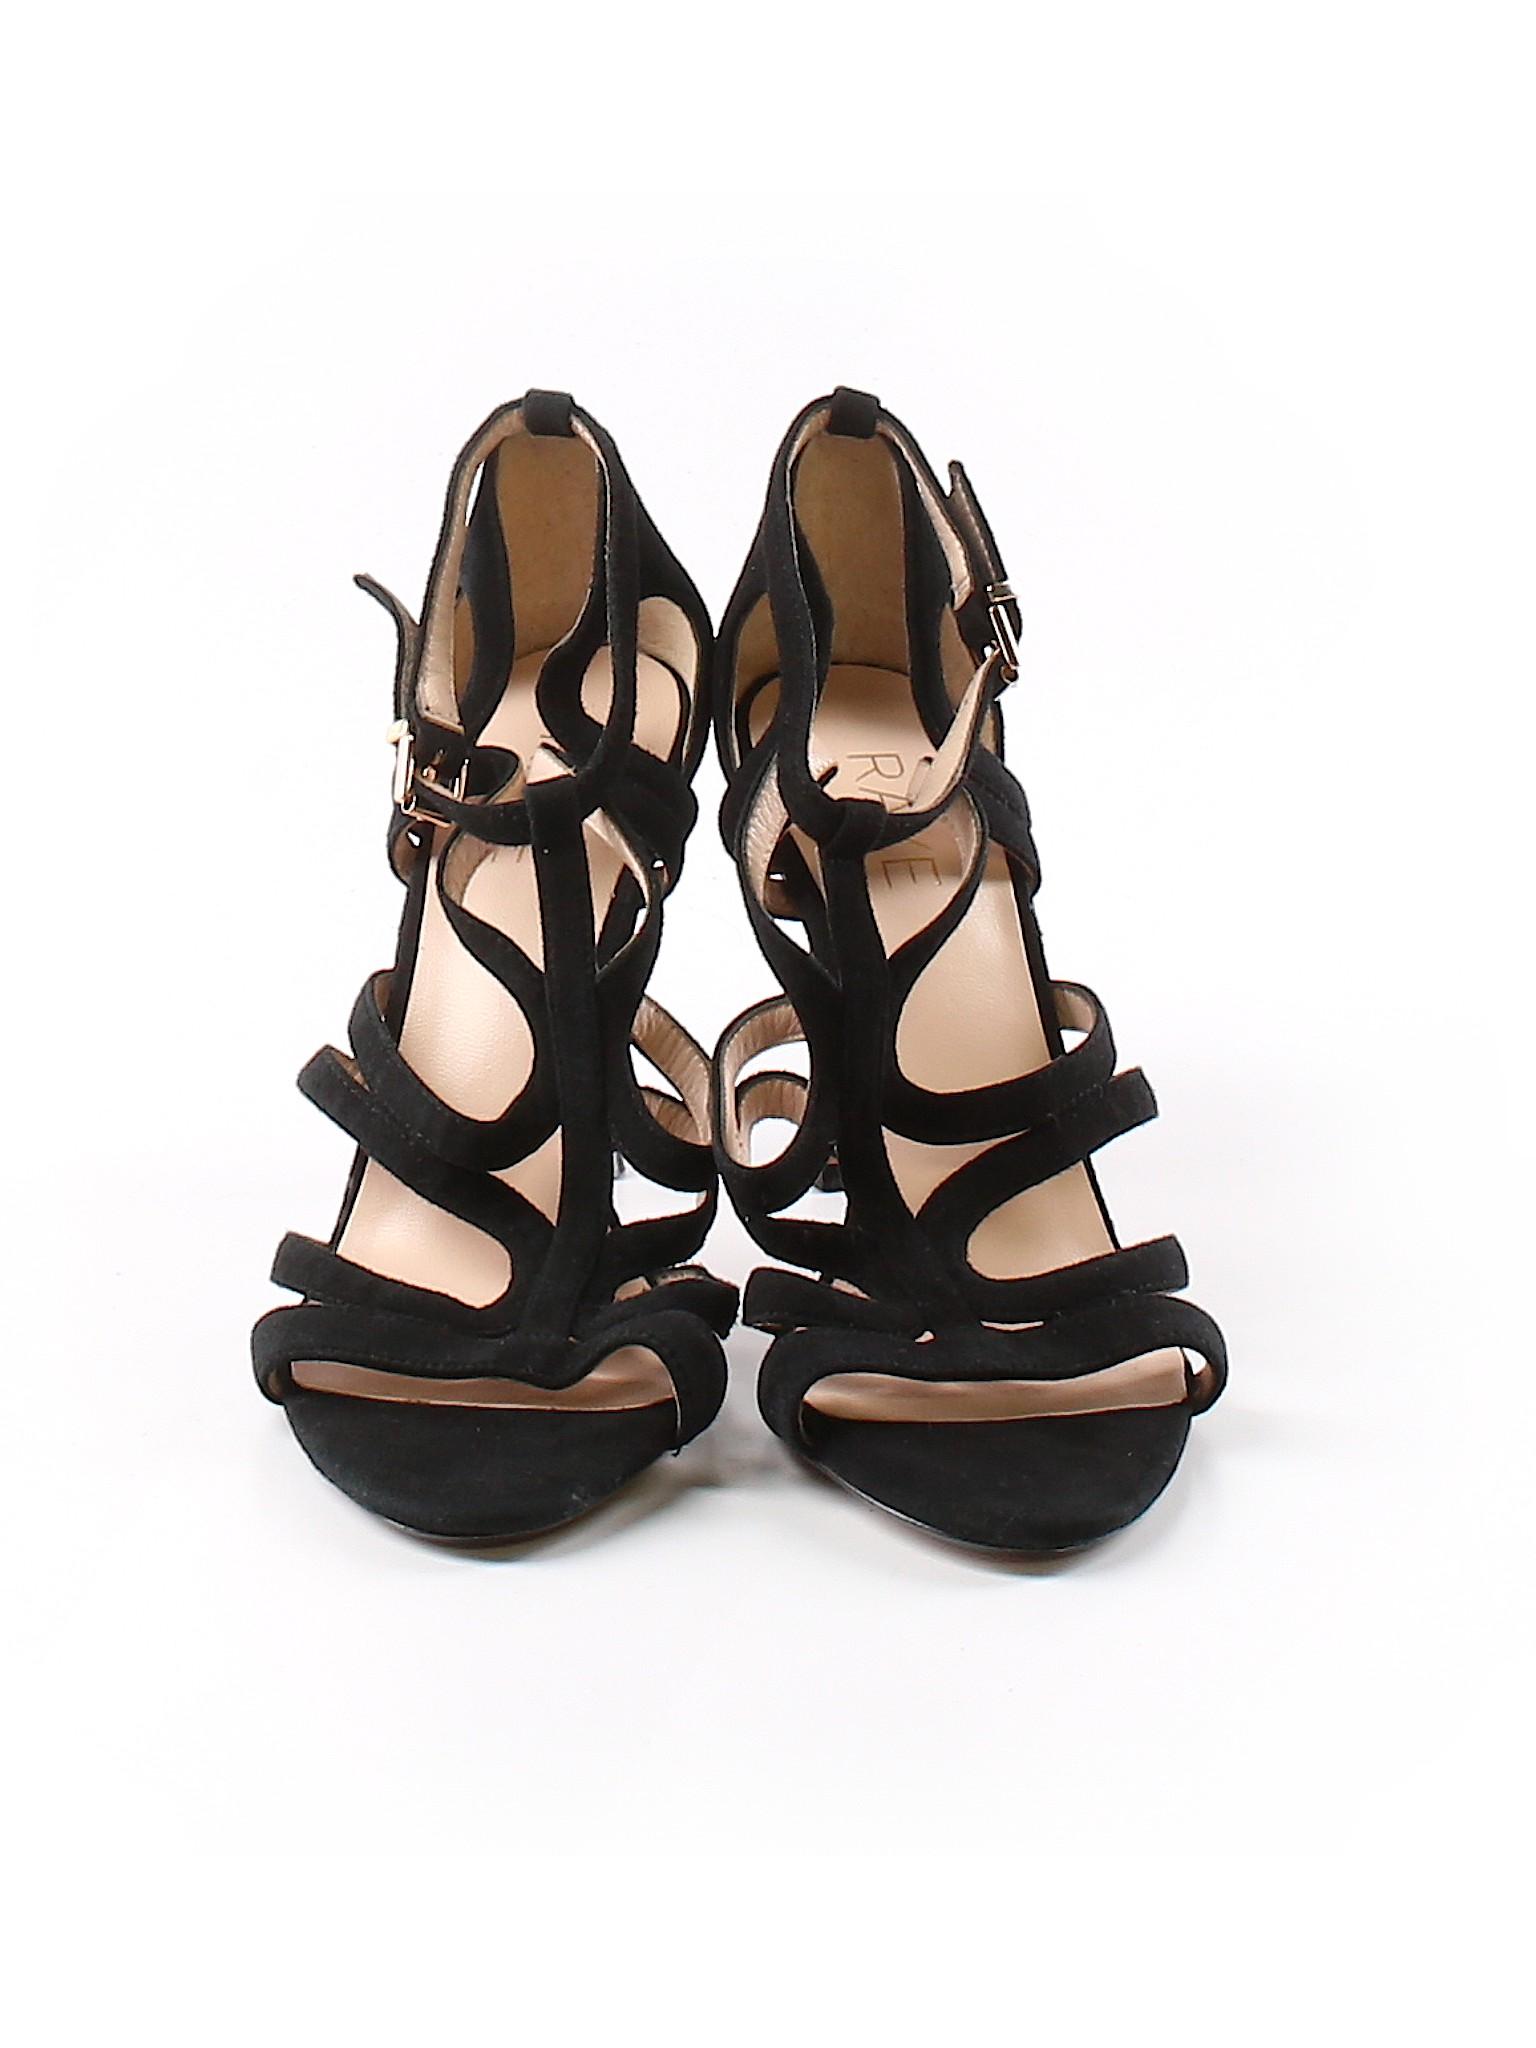 promotion RAYE Boutique RAYE Heels RAYE Heels Heels Boutique promotion Boutique promotion promotion Boutique RAYE rXPvr